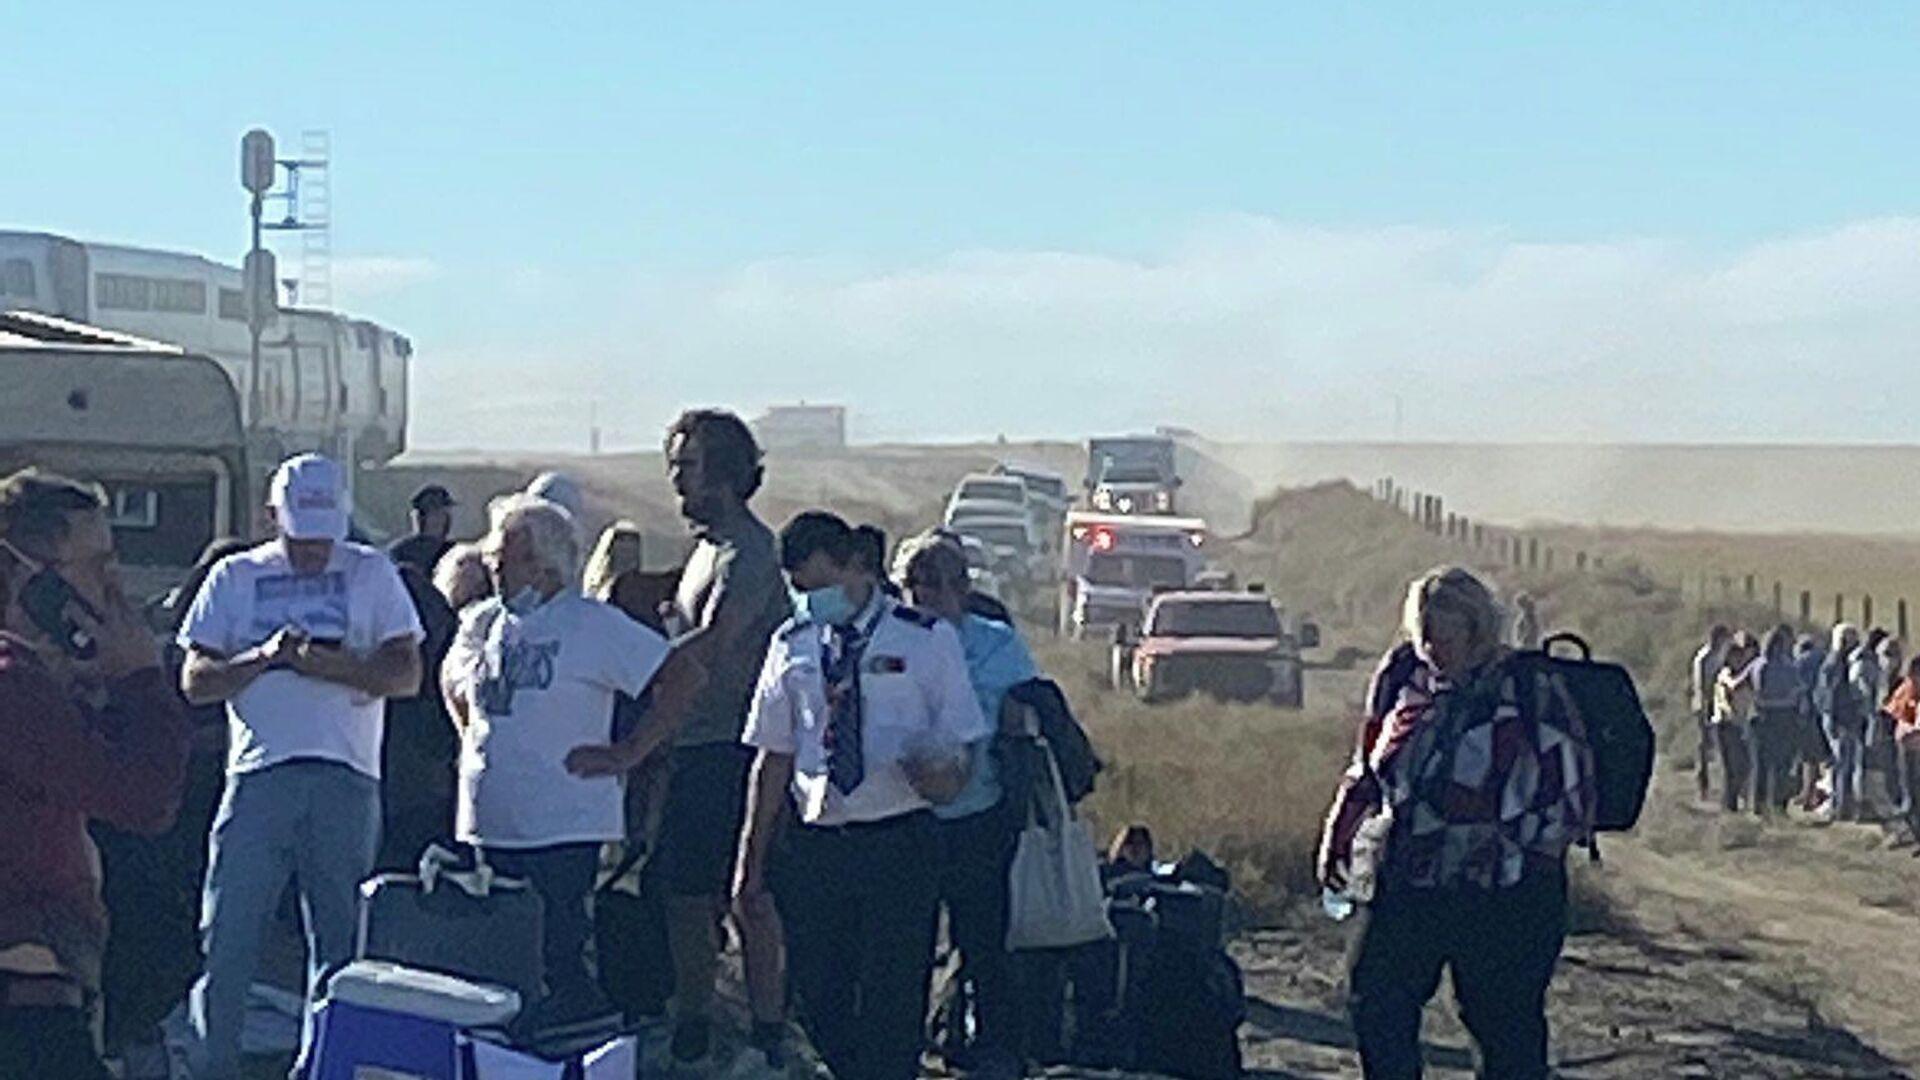 A Twitter image published by Jacob Cordeiro shows the scene following an Amtrak train derailment near Joplin, Montana, September 25, 2021.  - Sputnik International, 1920, 26.09.2021